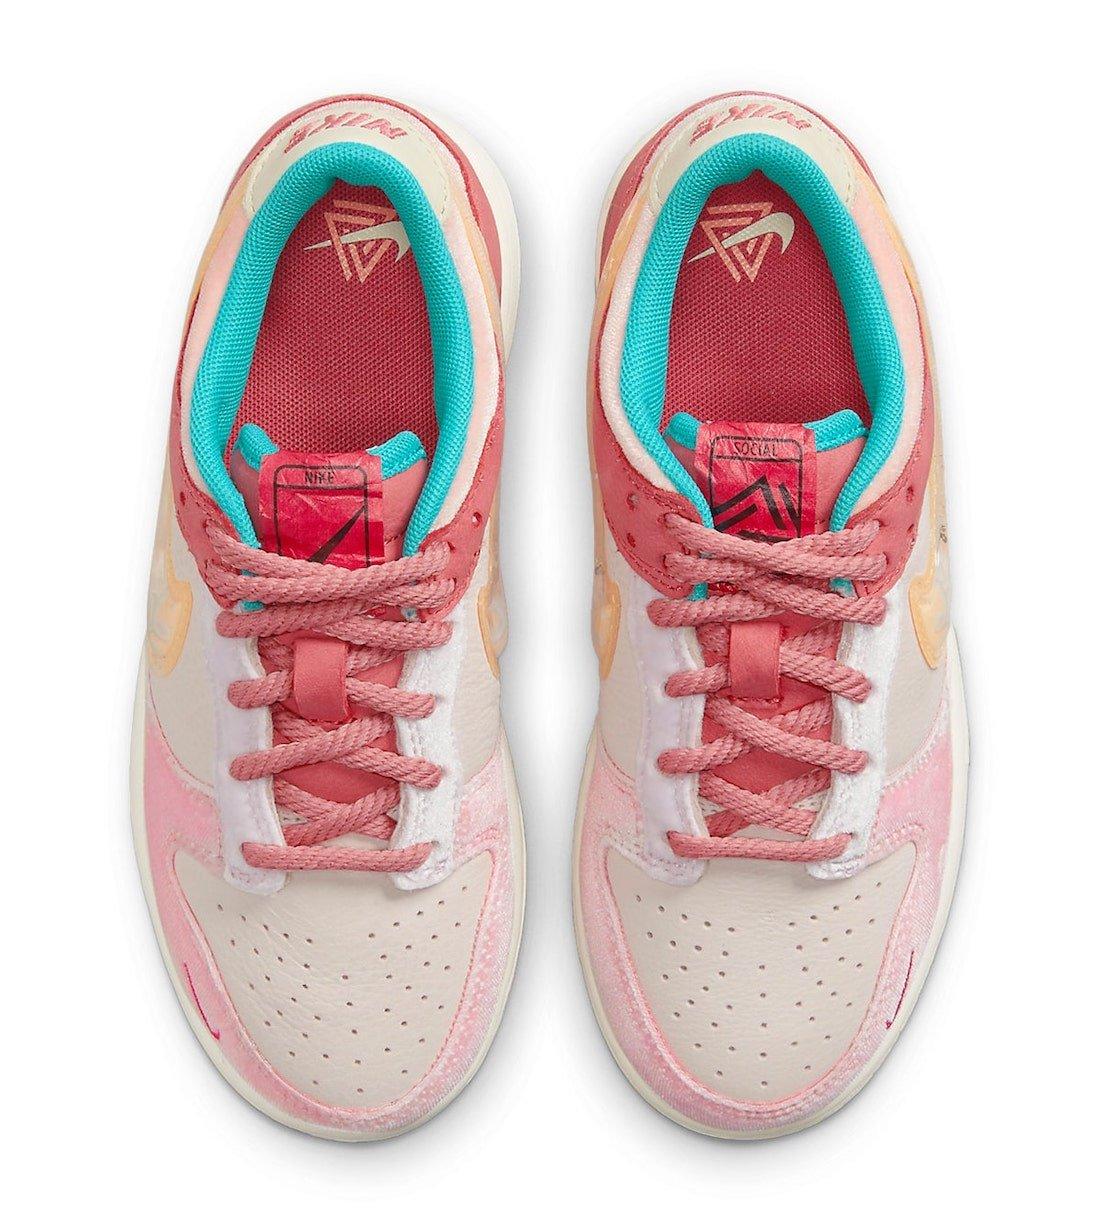 Social Status Nike Dunk Low DM3349-600 Release Date Info